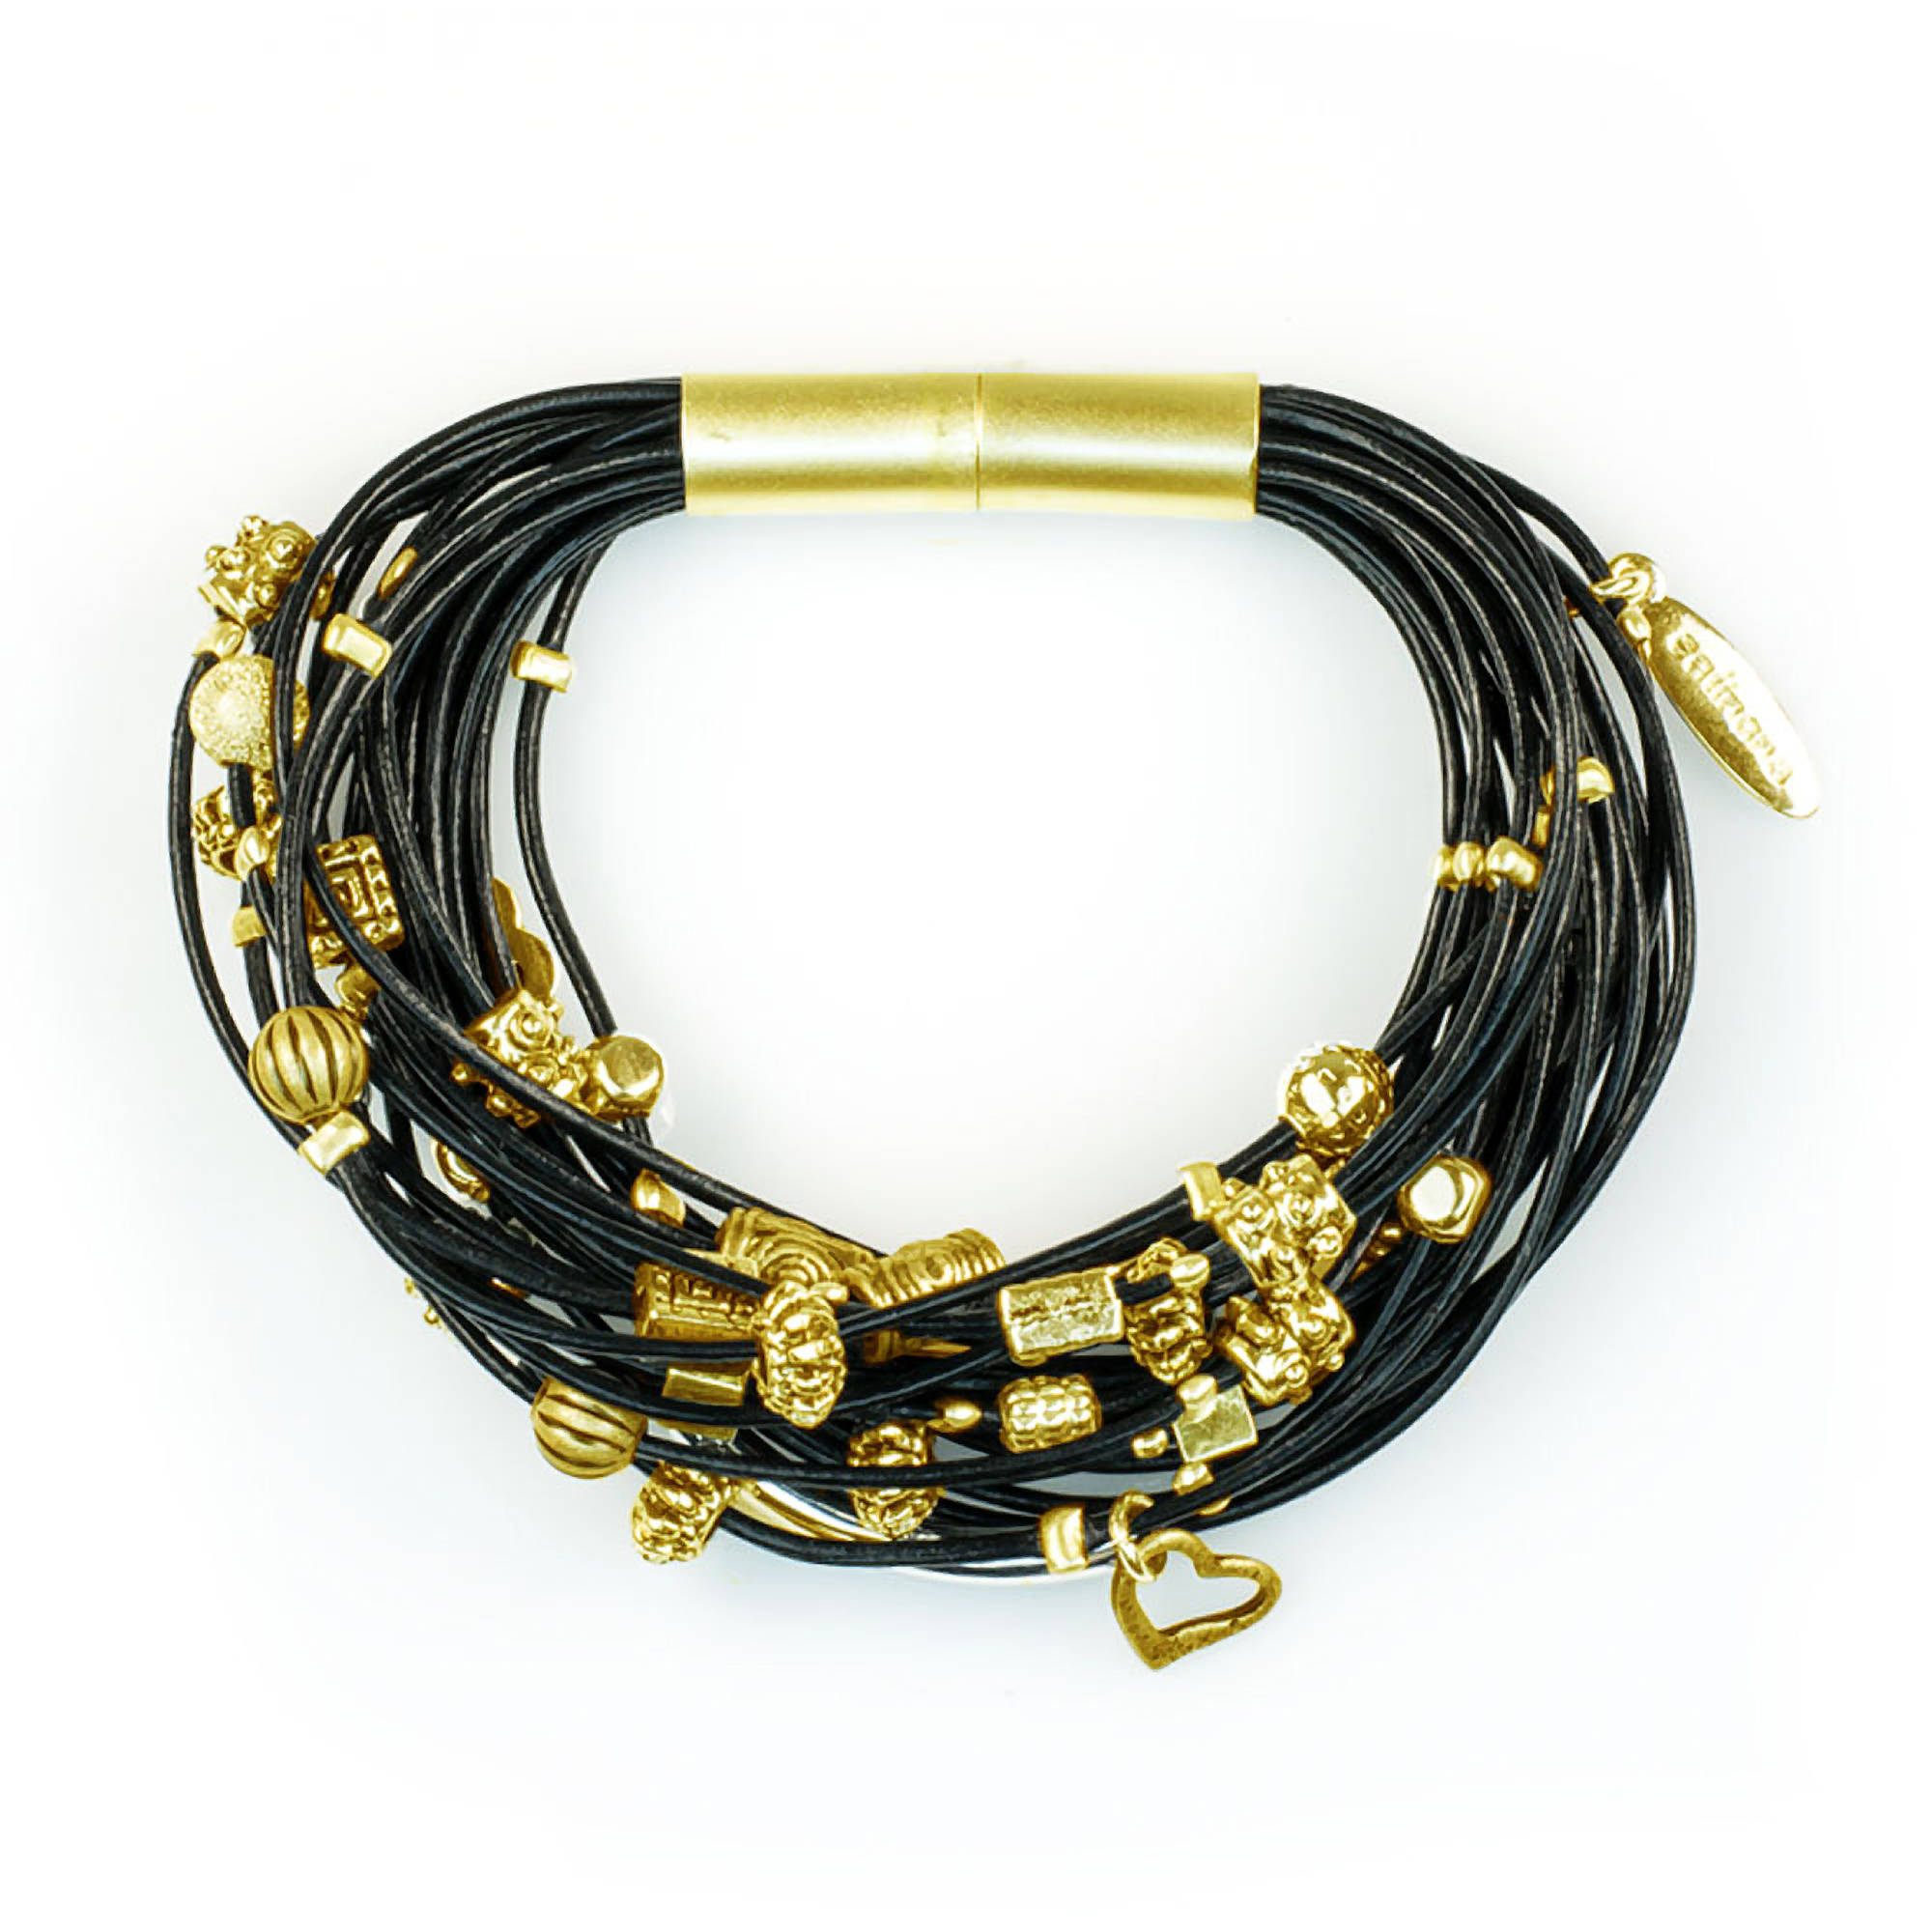 Miss Zoe by Calinana Multi Cord Leather Bracelet, Black/Gold